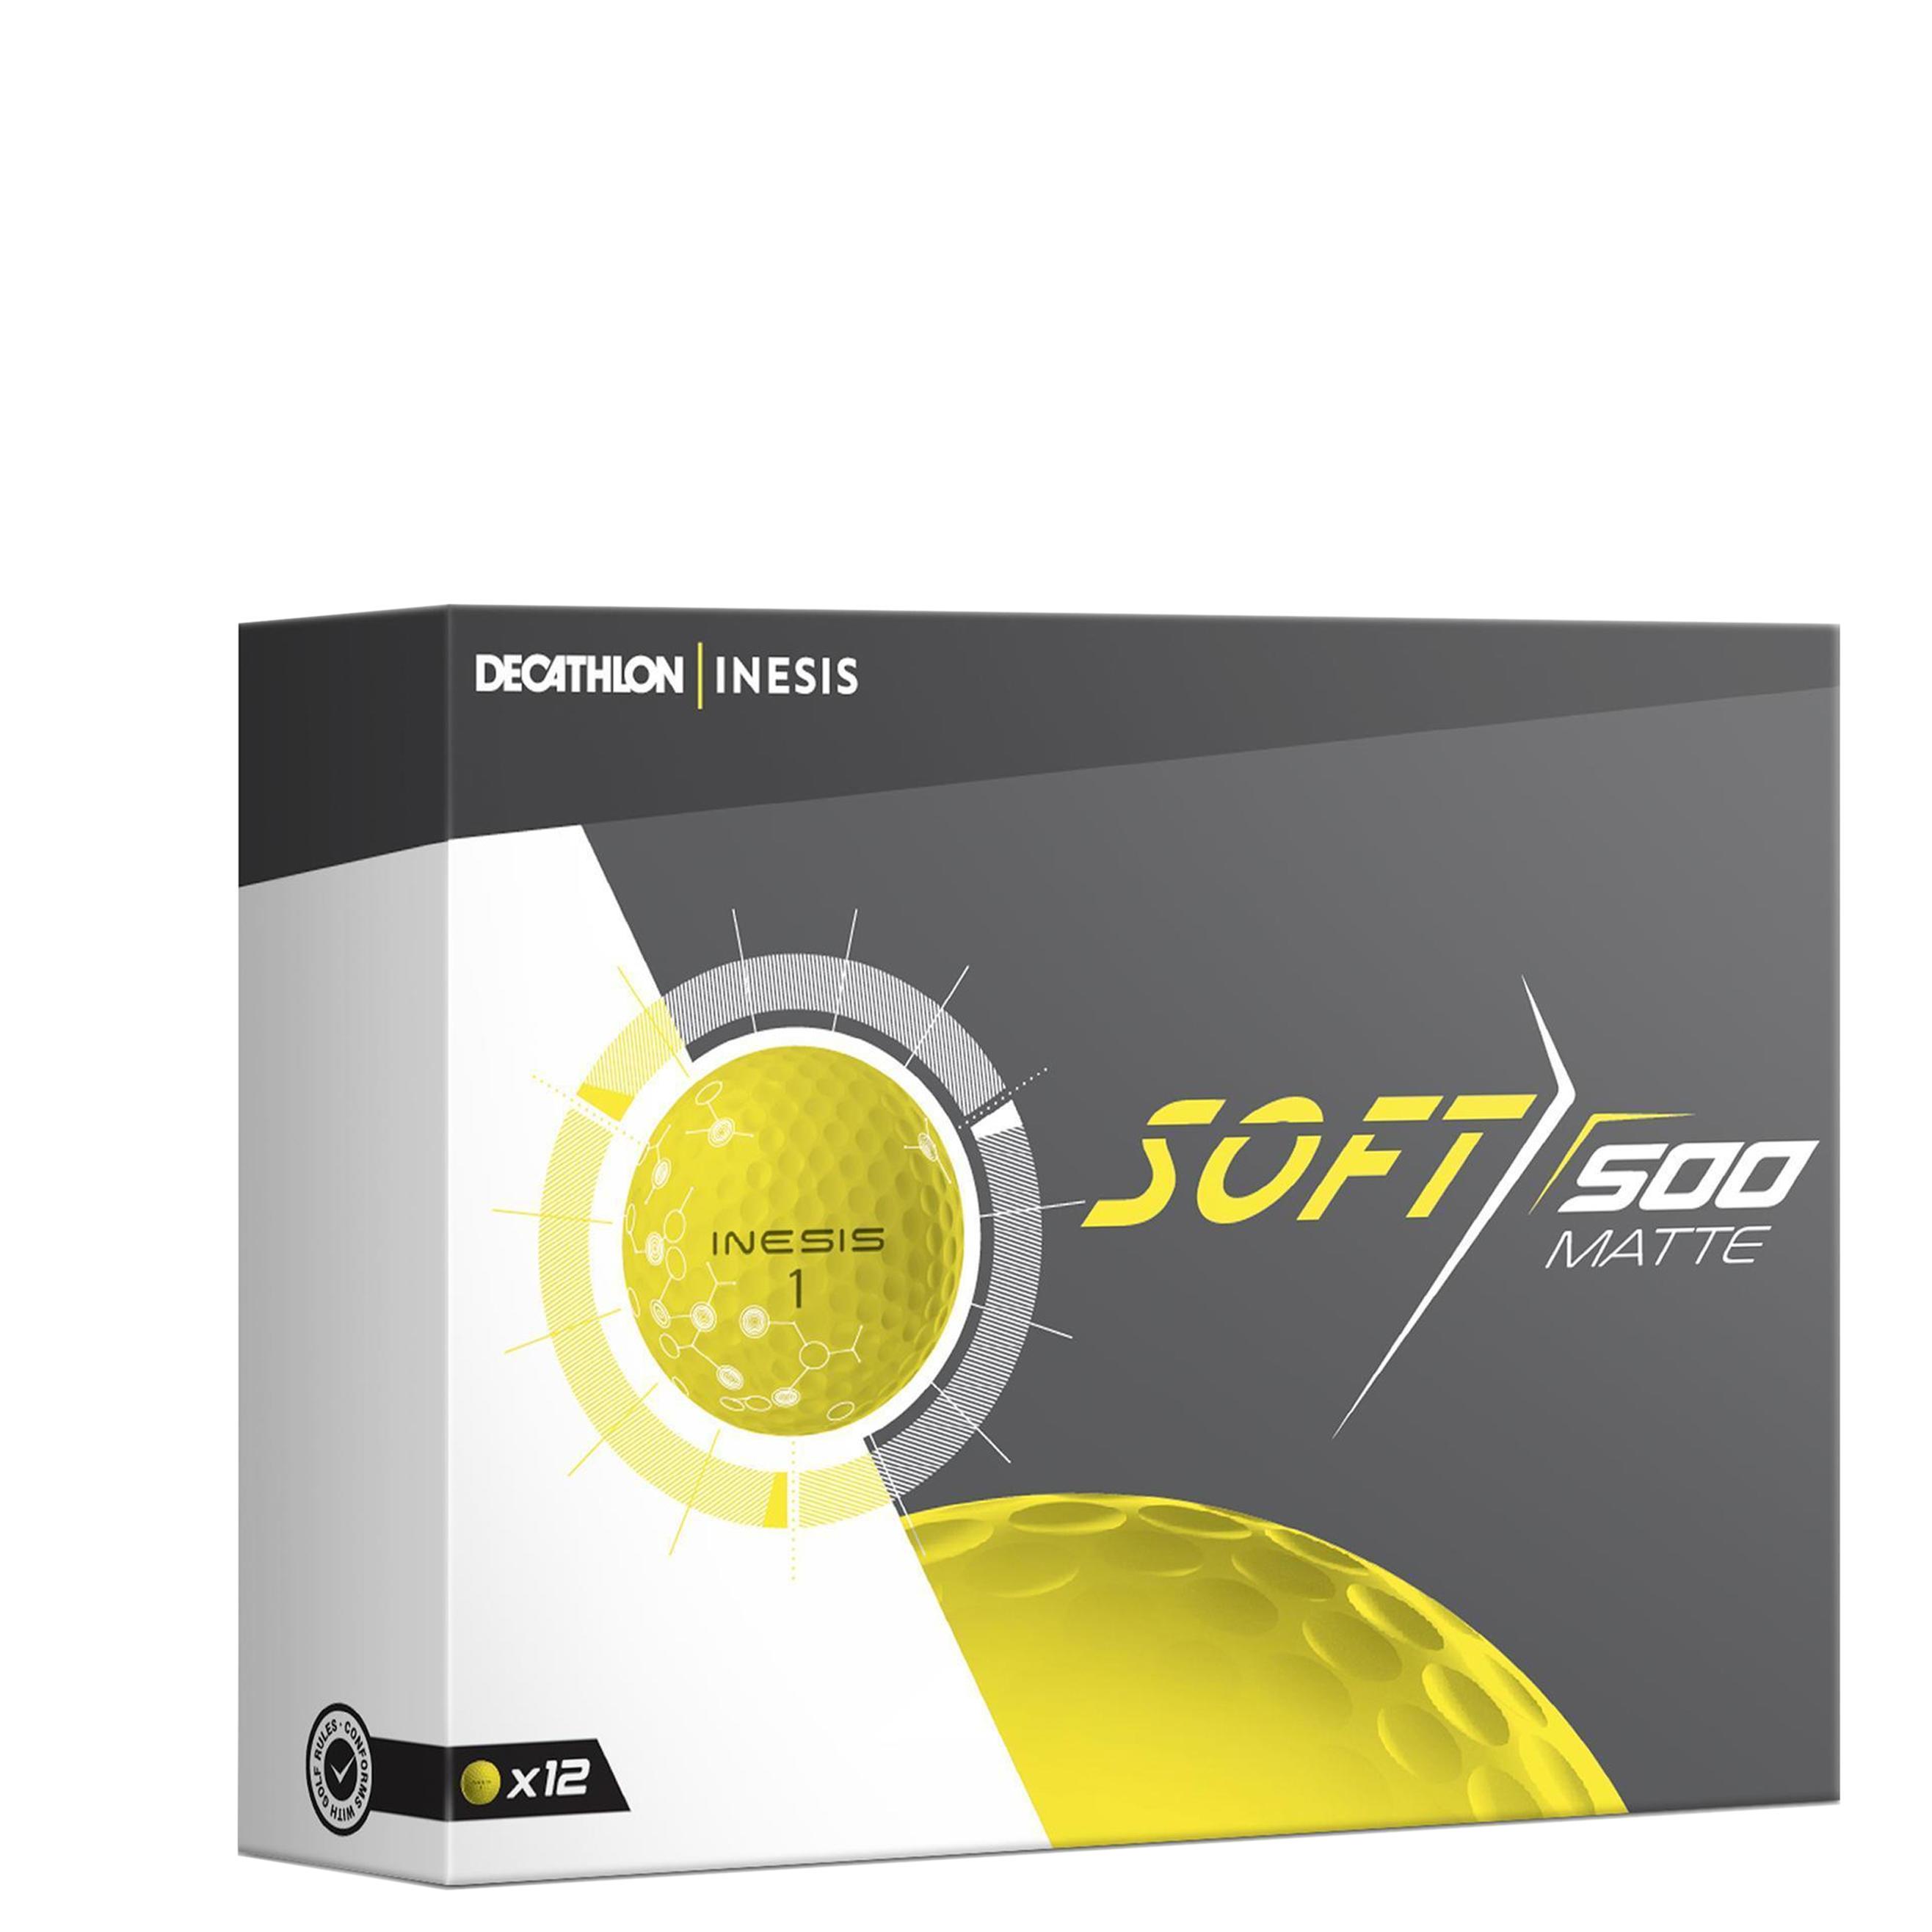 Minge Golf 500 Soft X12 la Reducere poza